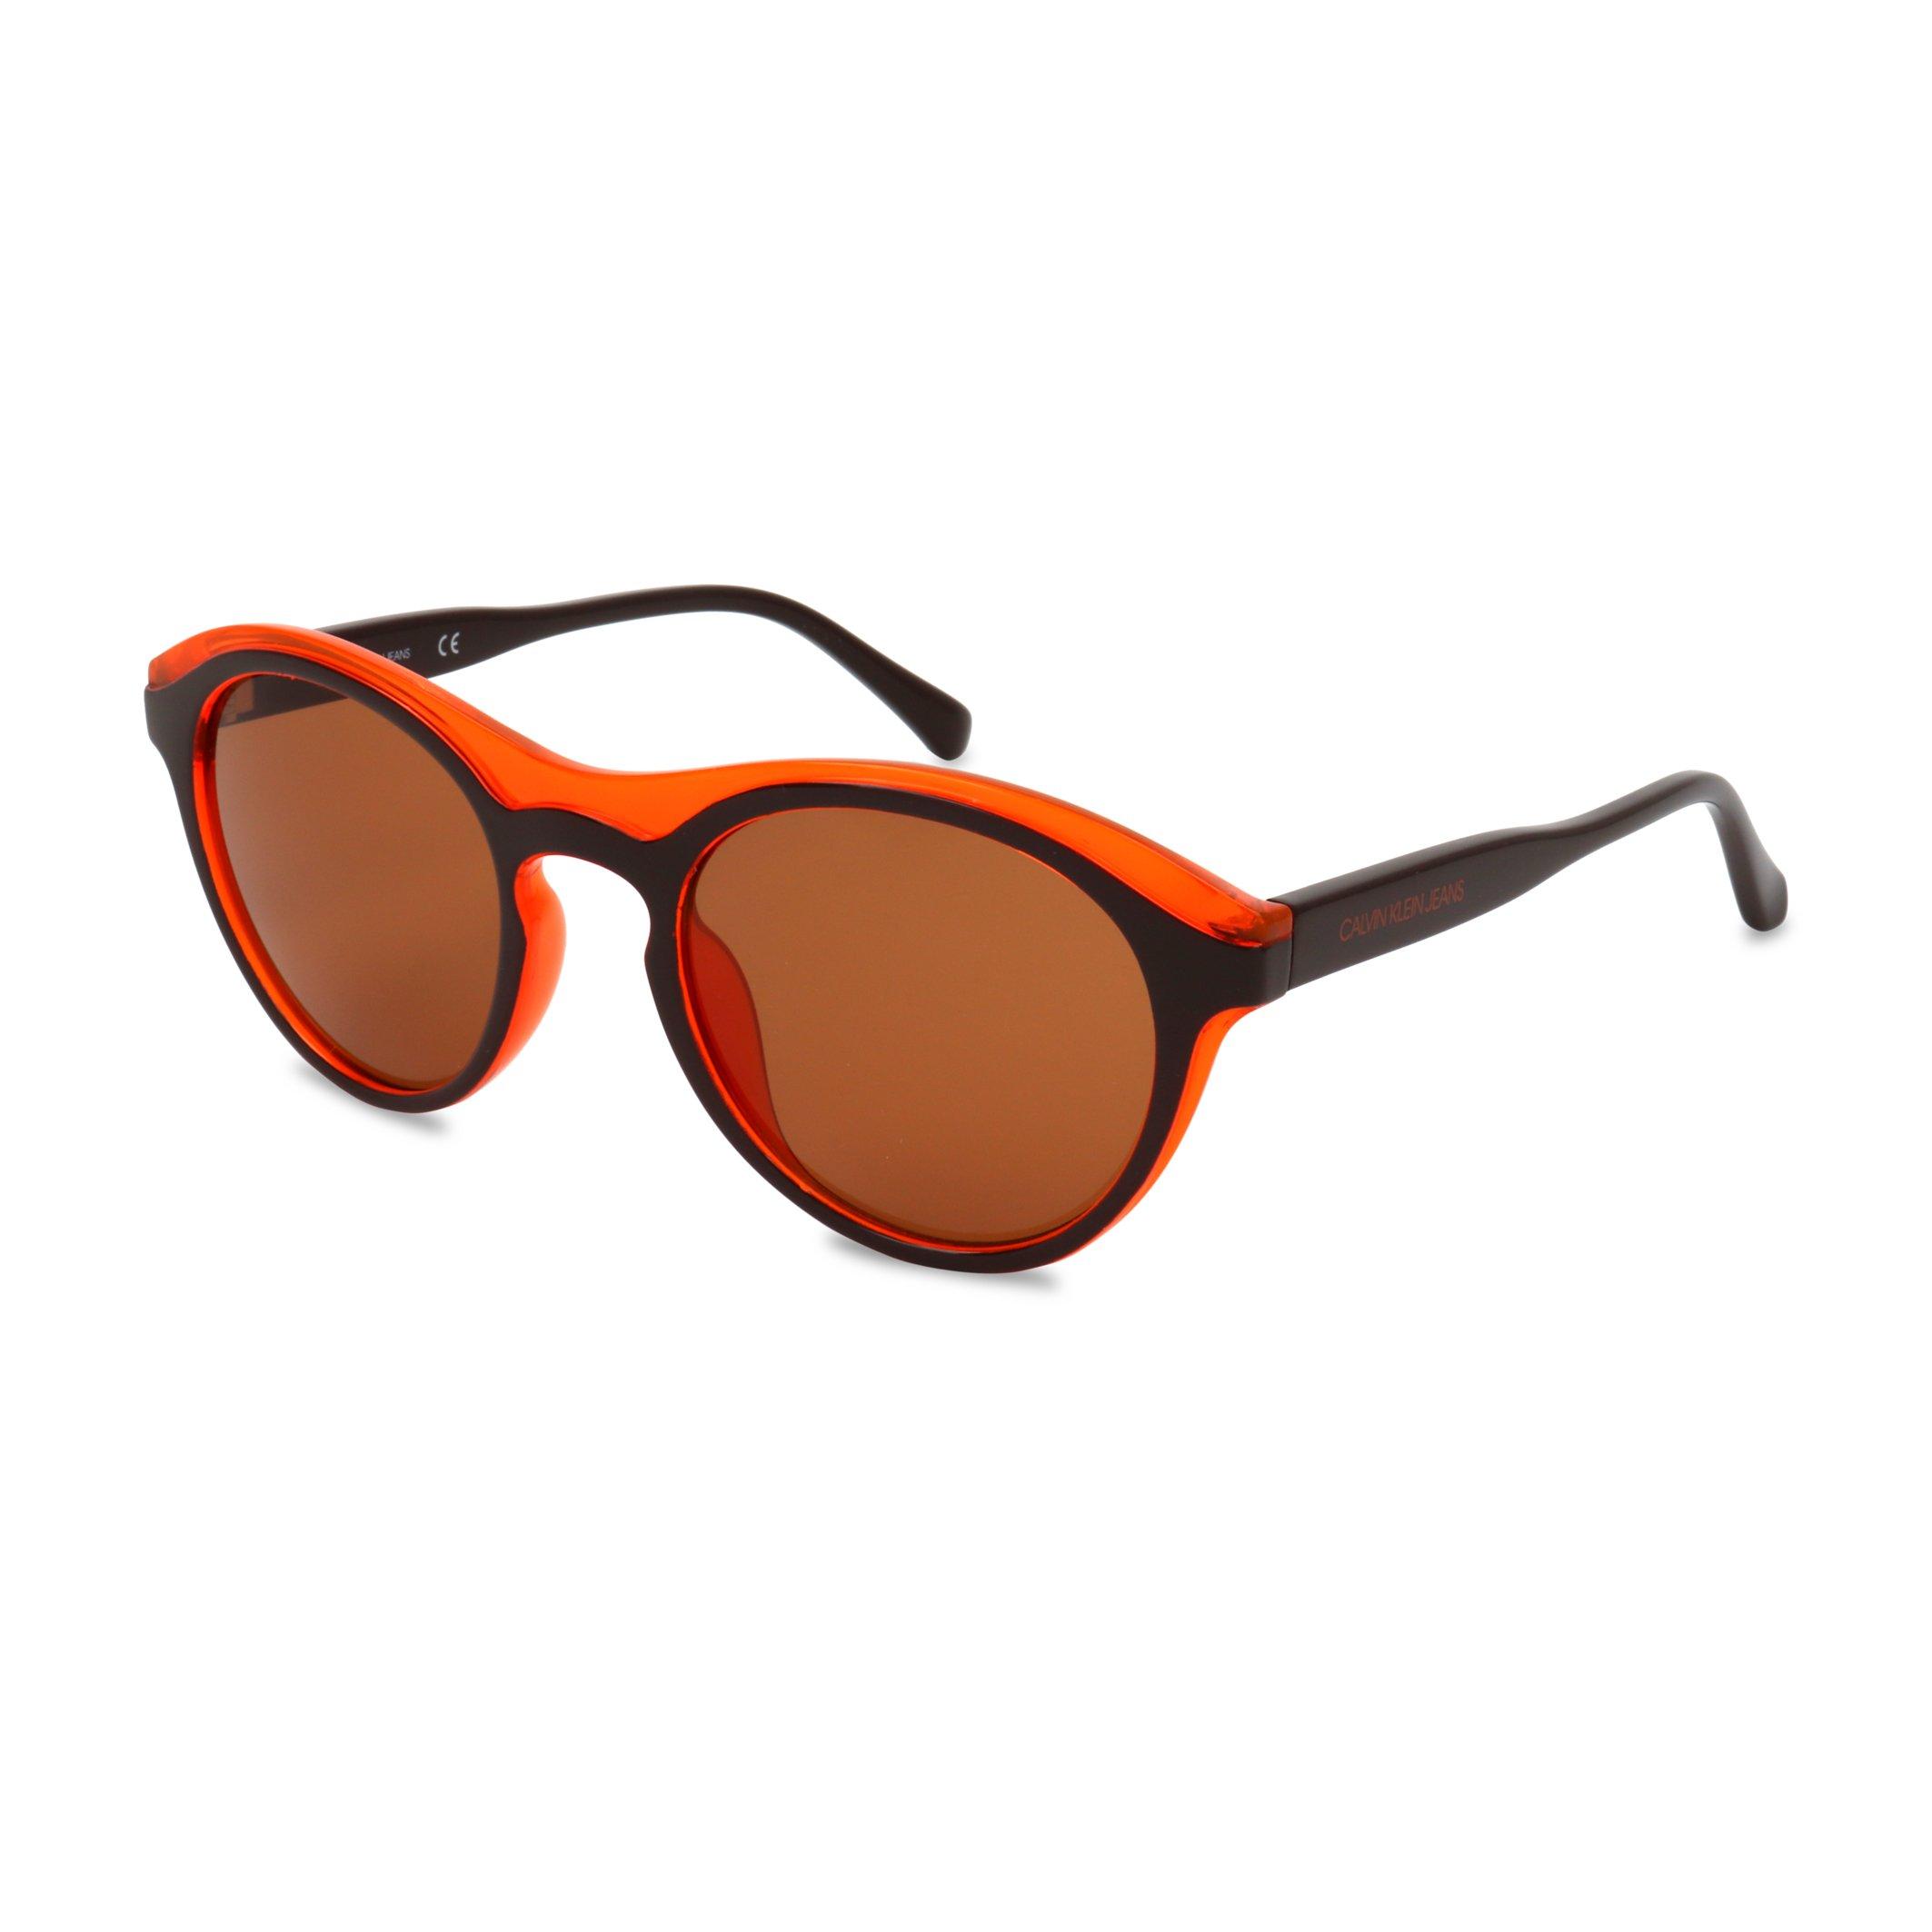 Calvin Klein Unisex Sunglasses Various Colours CKJ18503S - orange NOSIZE